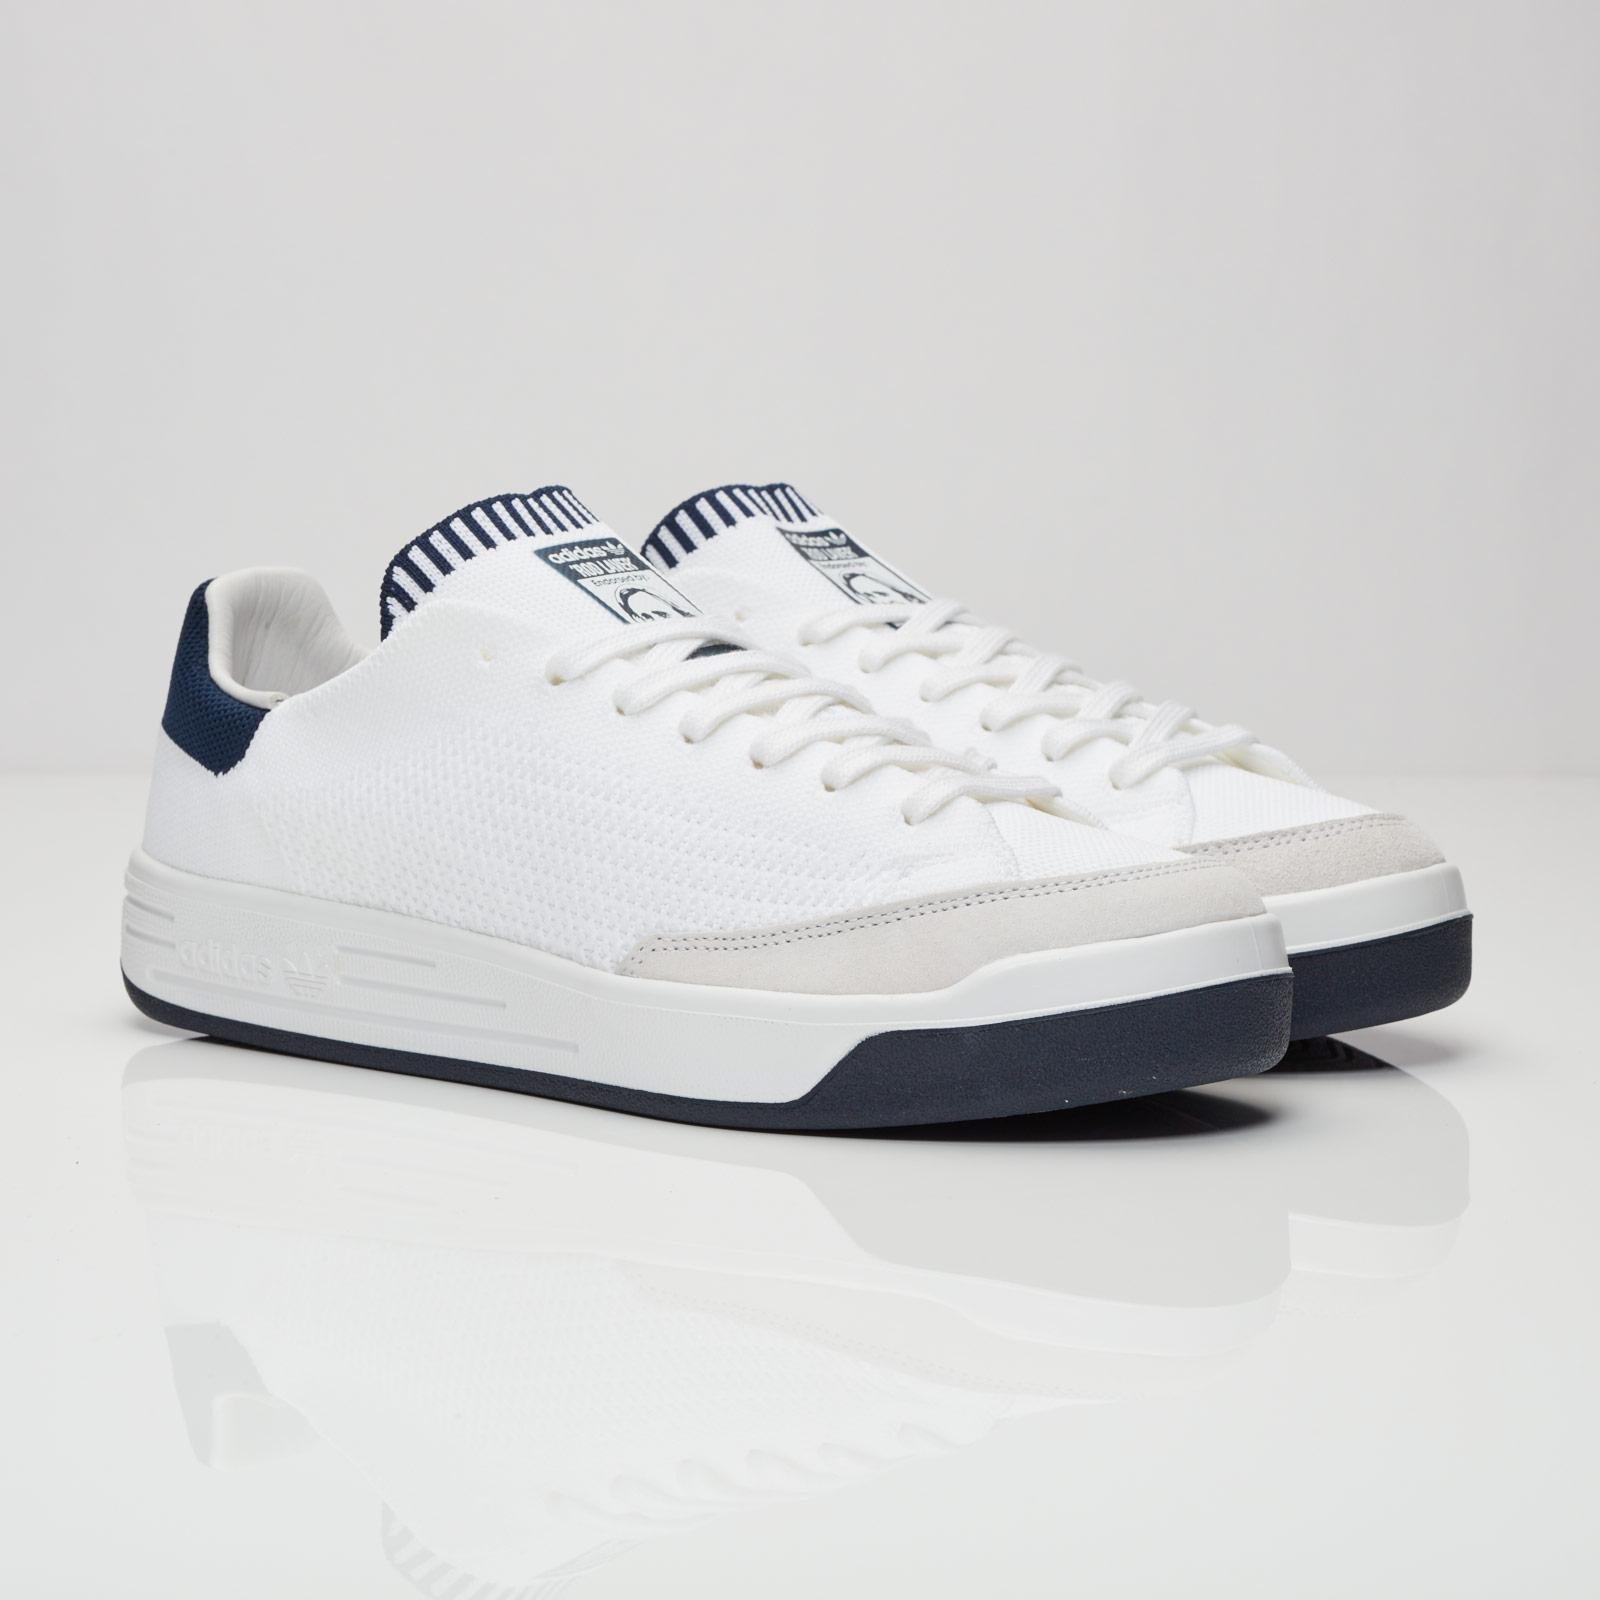 fc3c0cf10d7850 adidas Rod Laver Super Primeknit - S80512 - Sneakersnstuff ...